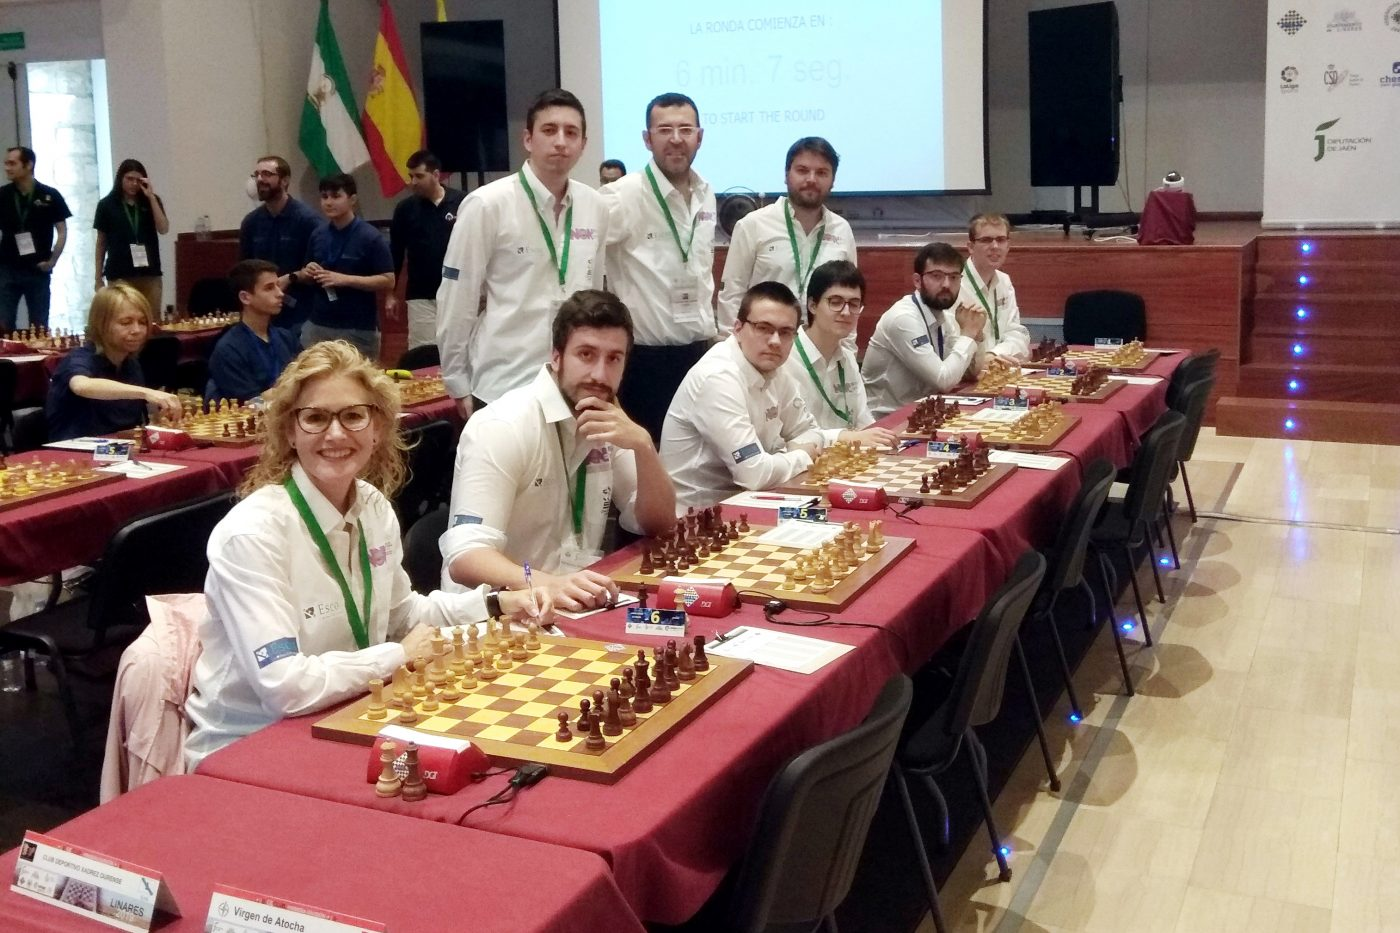 xadrez ourense linares 2019